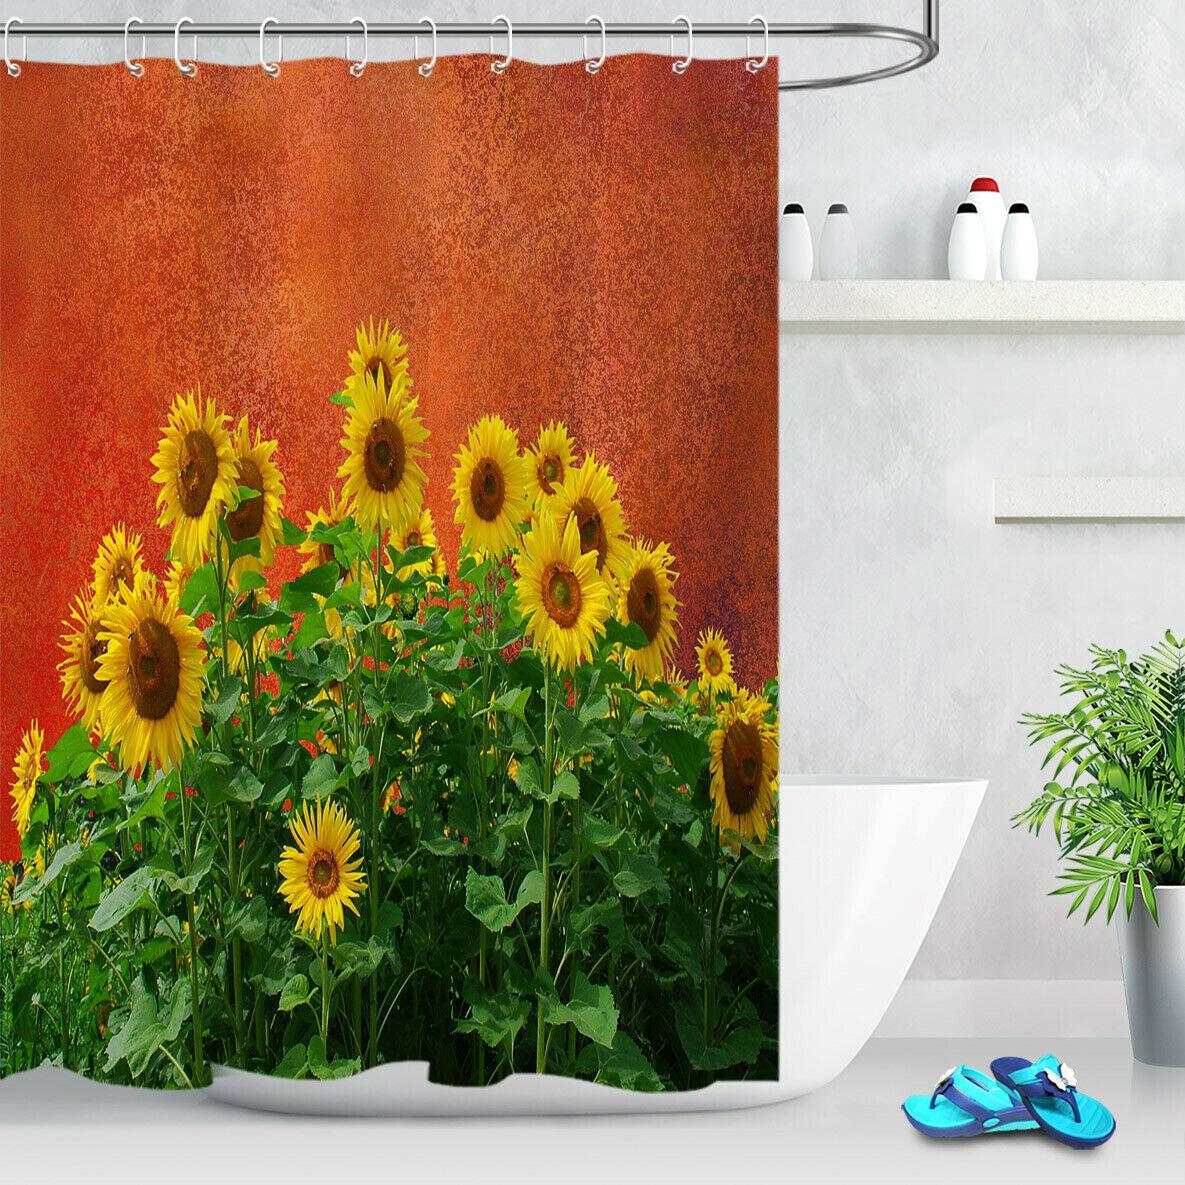 Sunflower Flower Red Wall Shower Curtain Bathroom Durable Fabric Mildew Bathroom Accessories Creative With 12 Hooks 180x180cm